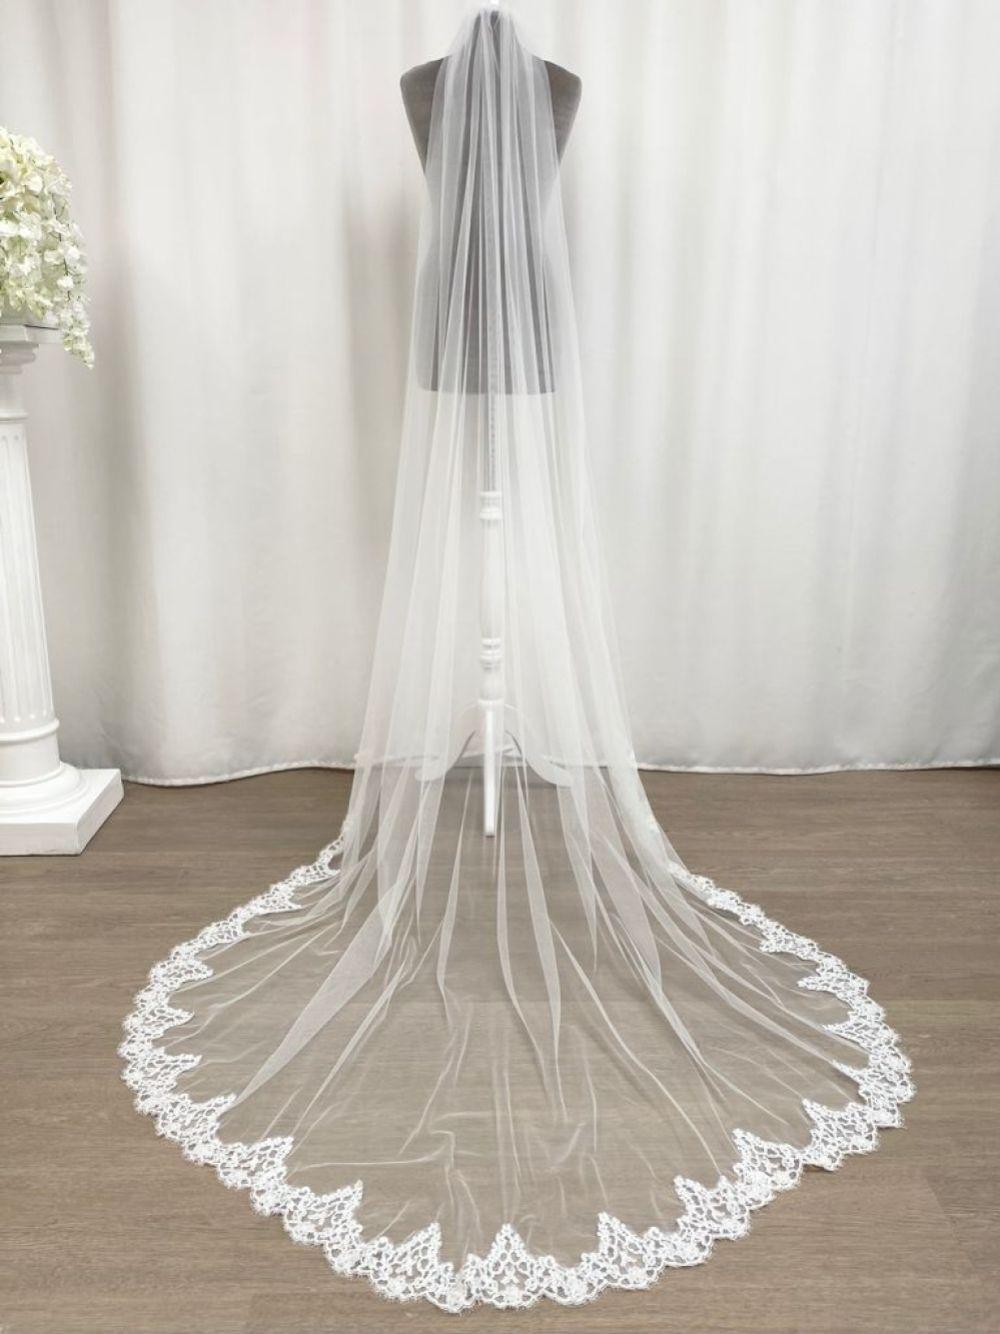 Joyce Jackson Parma Single Tier Corded Lace Edge Chapel Veil